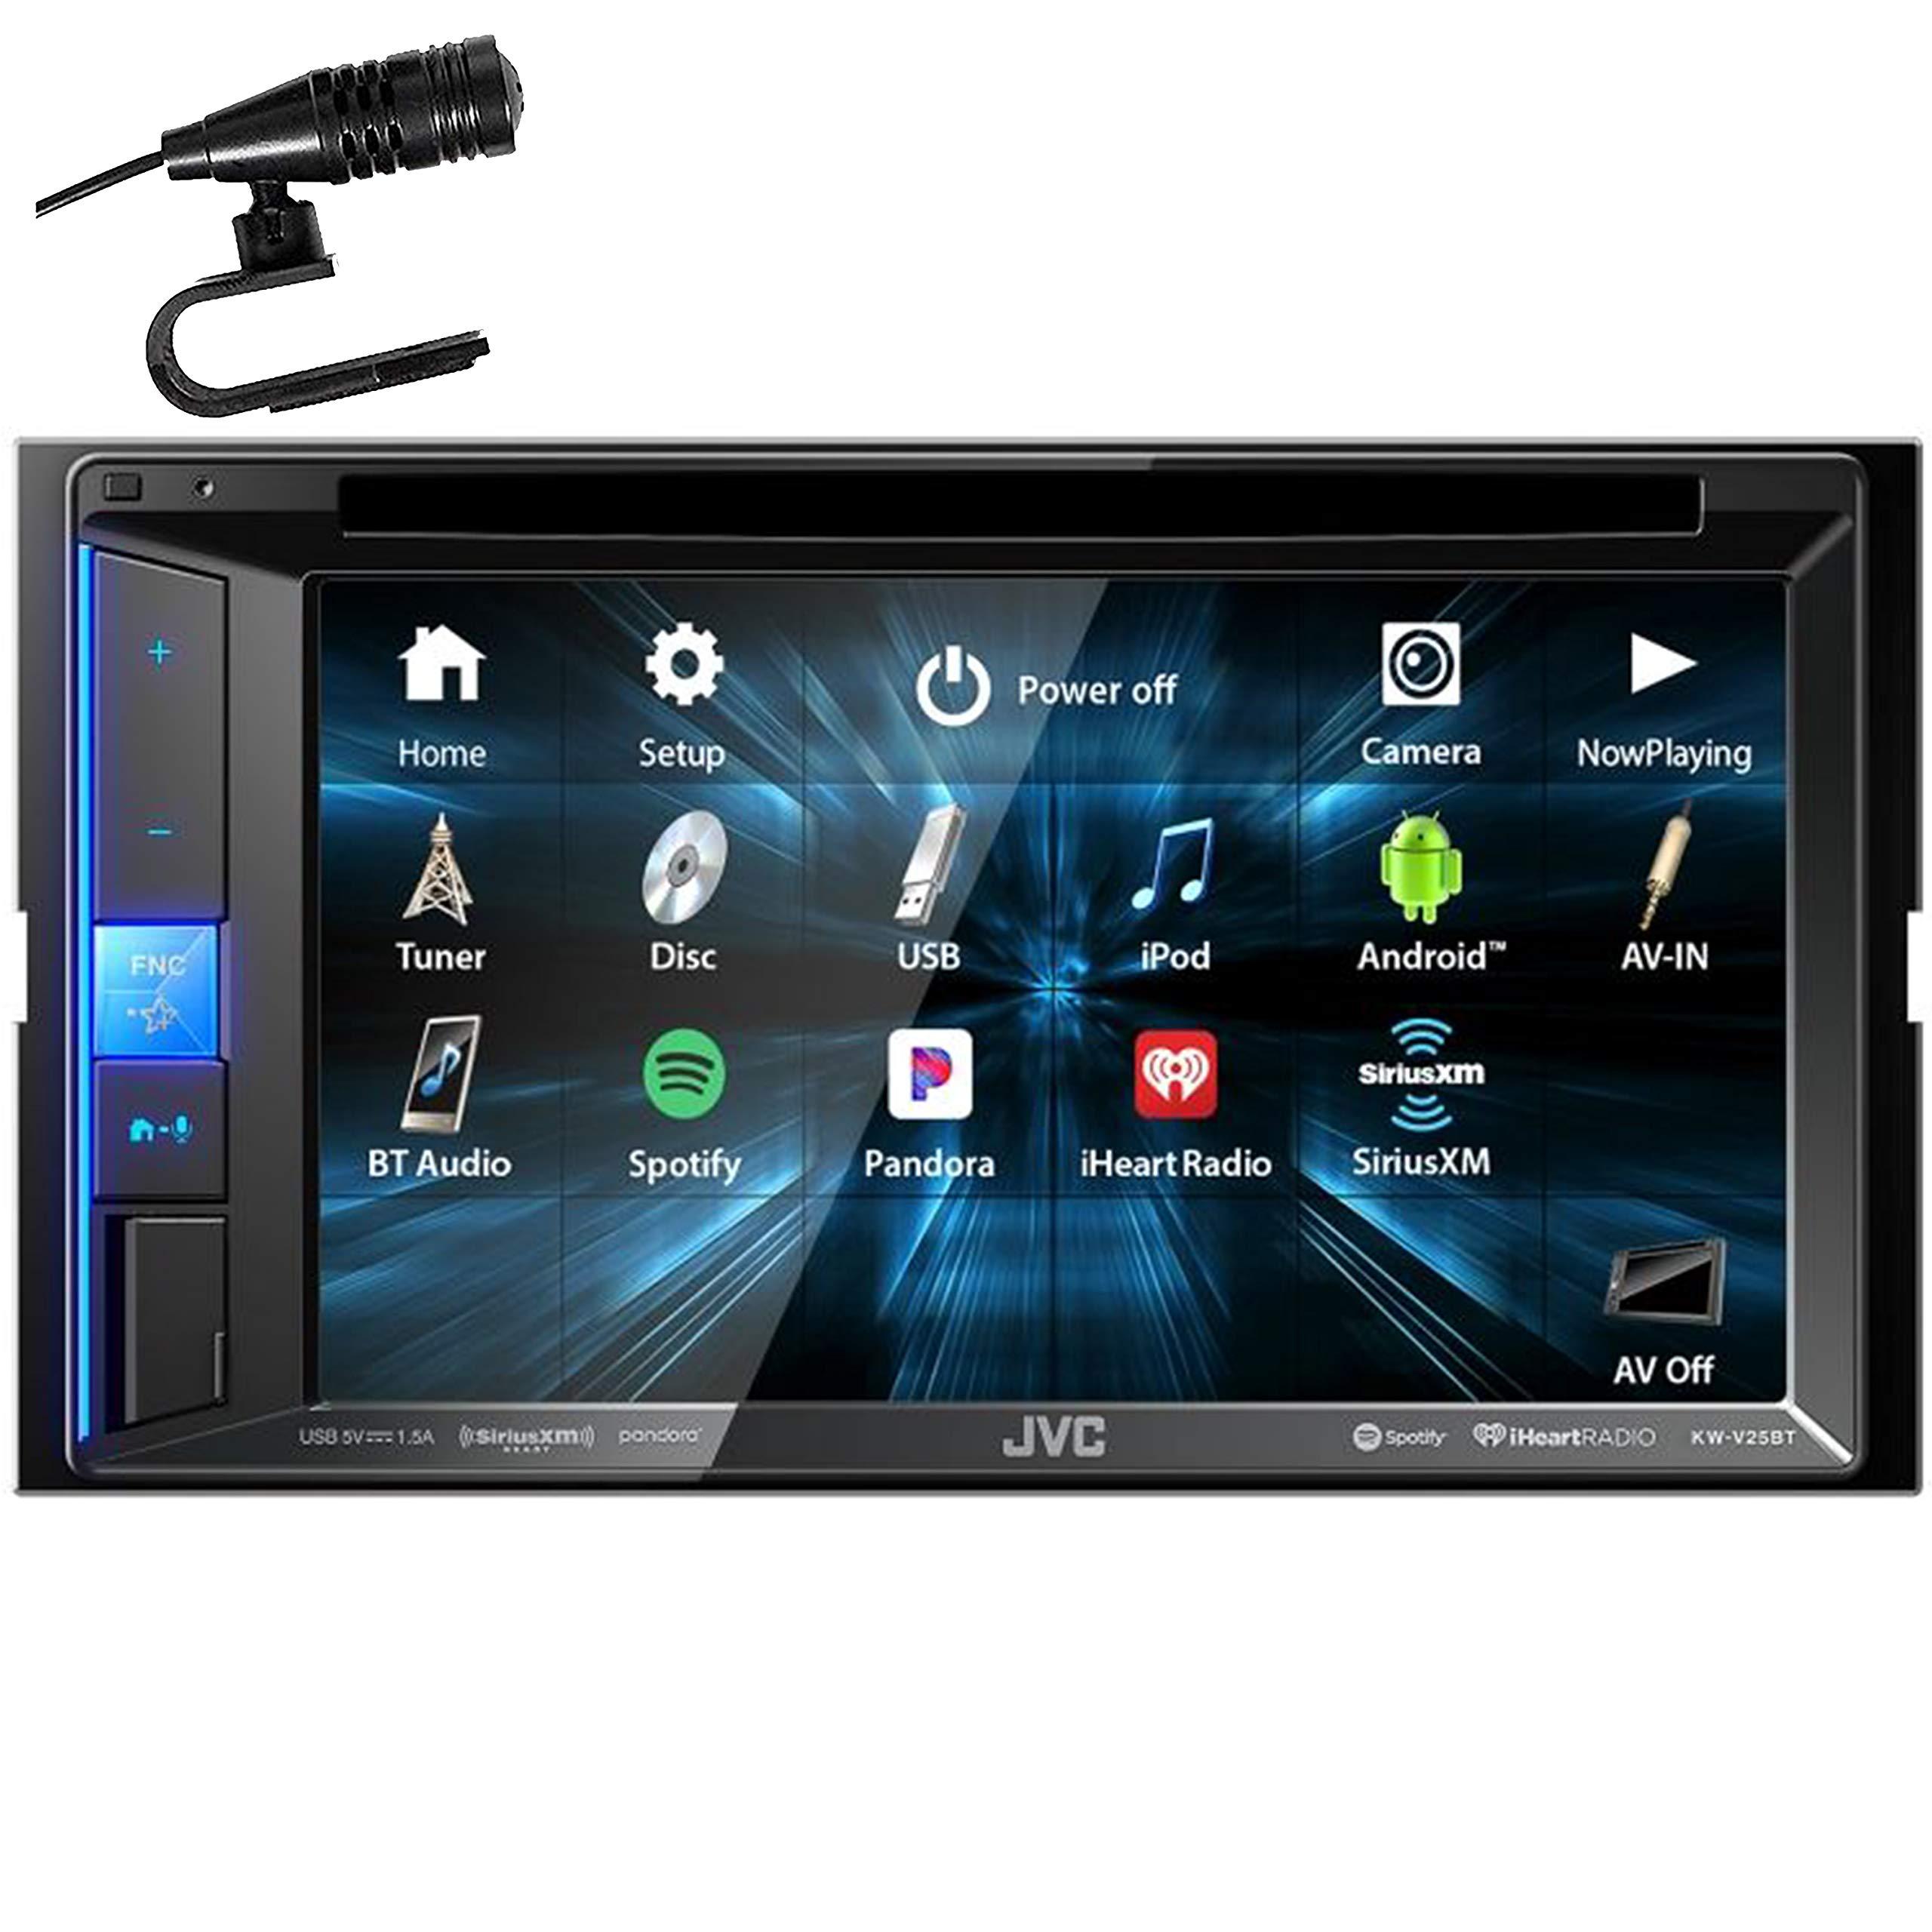 JVC KW-V25BT 6.2'' WVGA Clear Resistive Touch Monitor/Bluetooth / 13-Band EQ by JVC